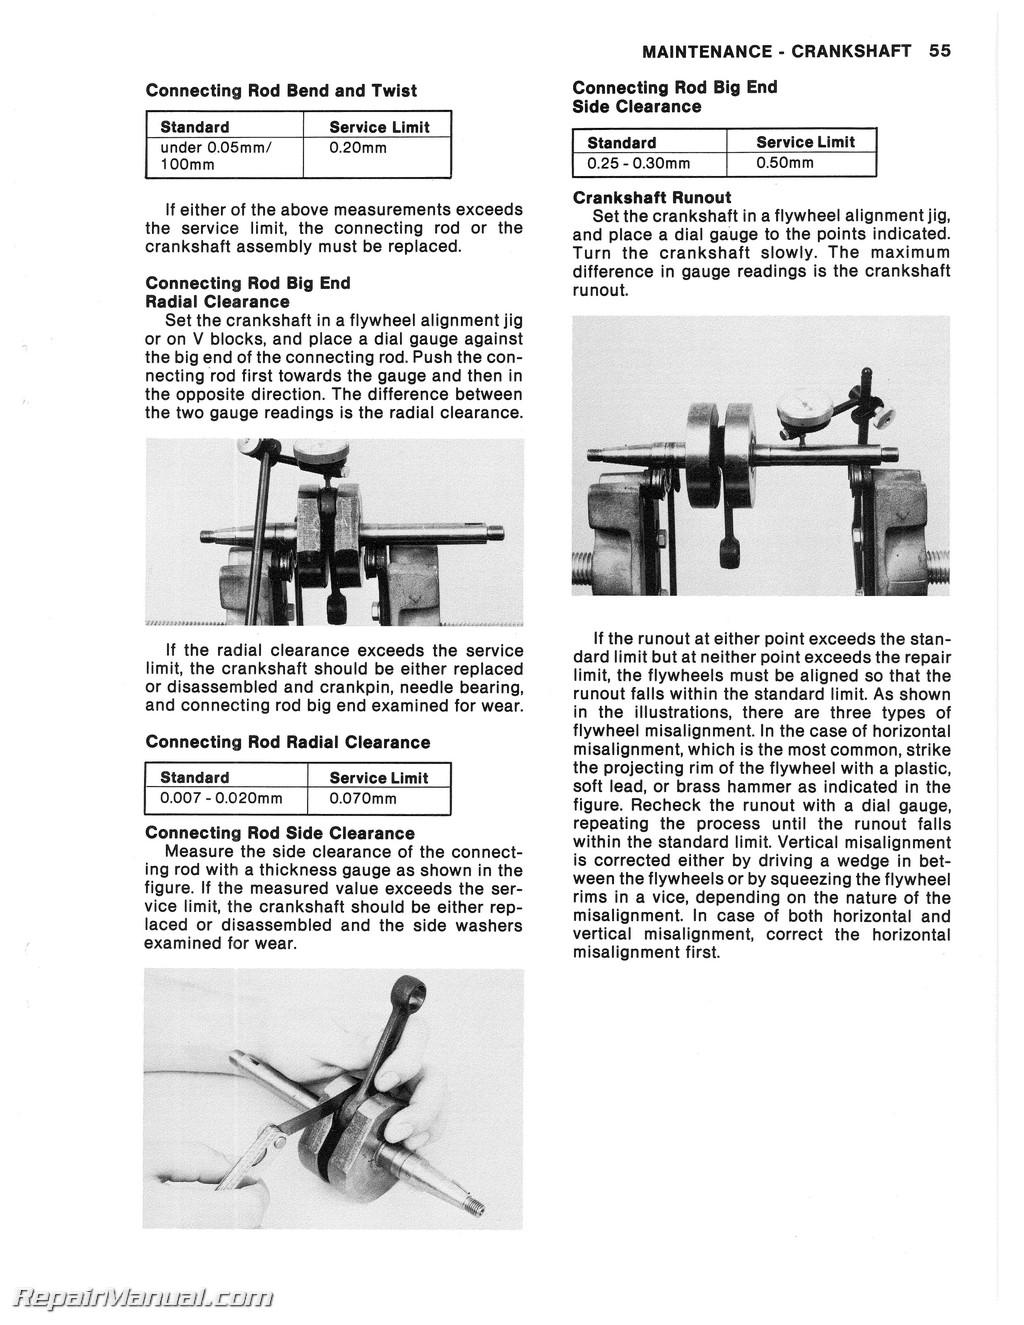 1971 1980 kawasaki mt1 kv75 motorcycle service manual ebay. Black Bedroom Furniture Sets. Home Design Ideas